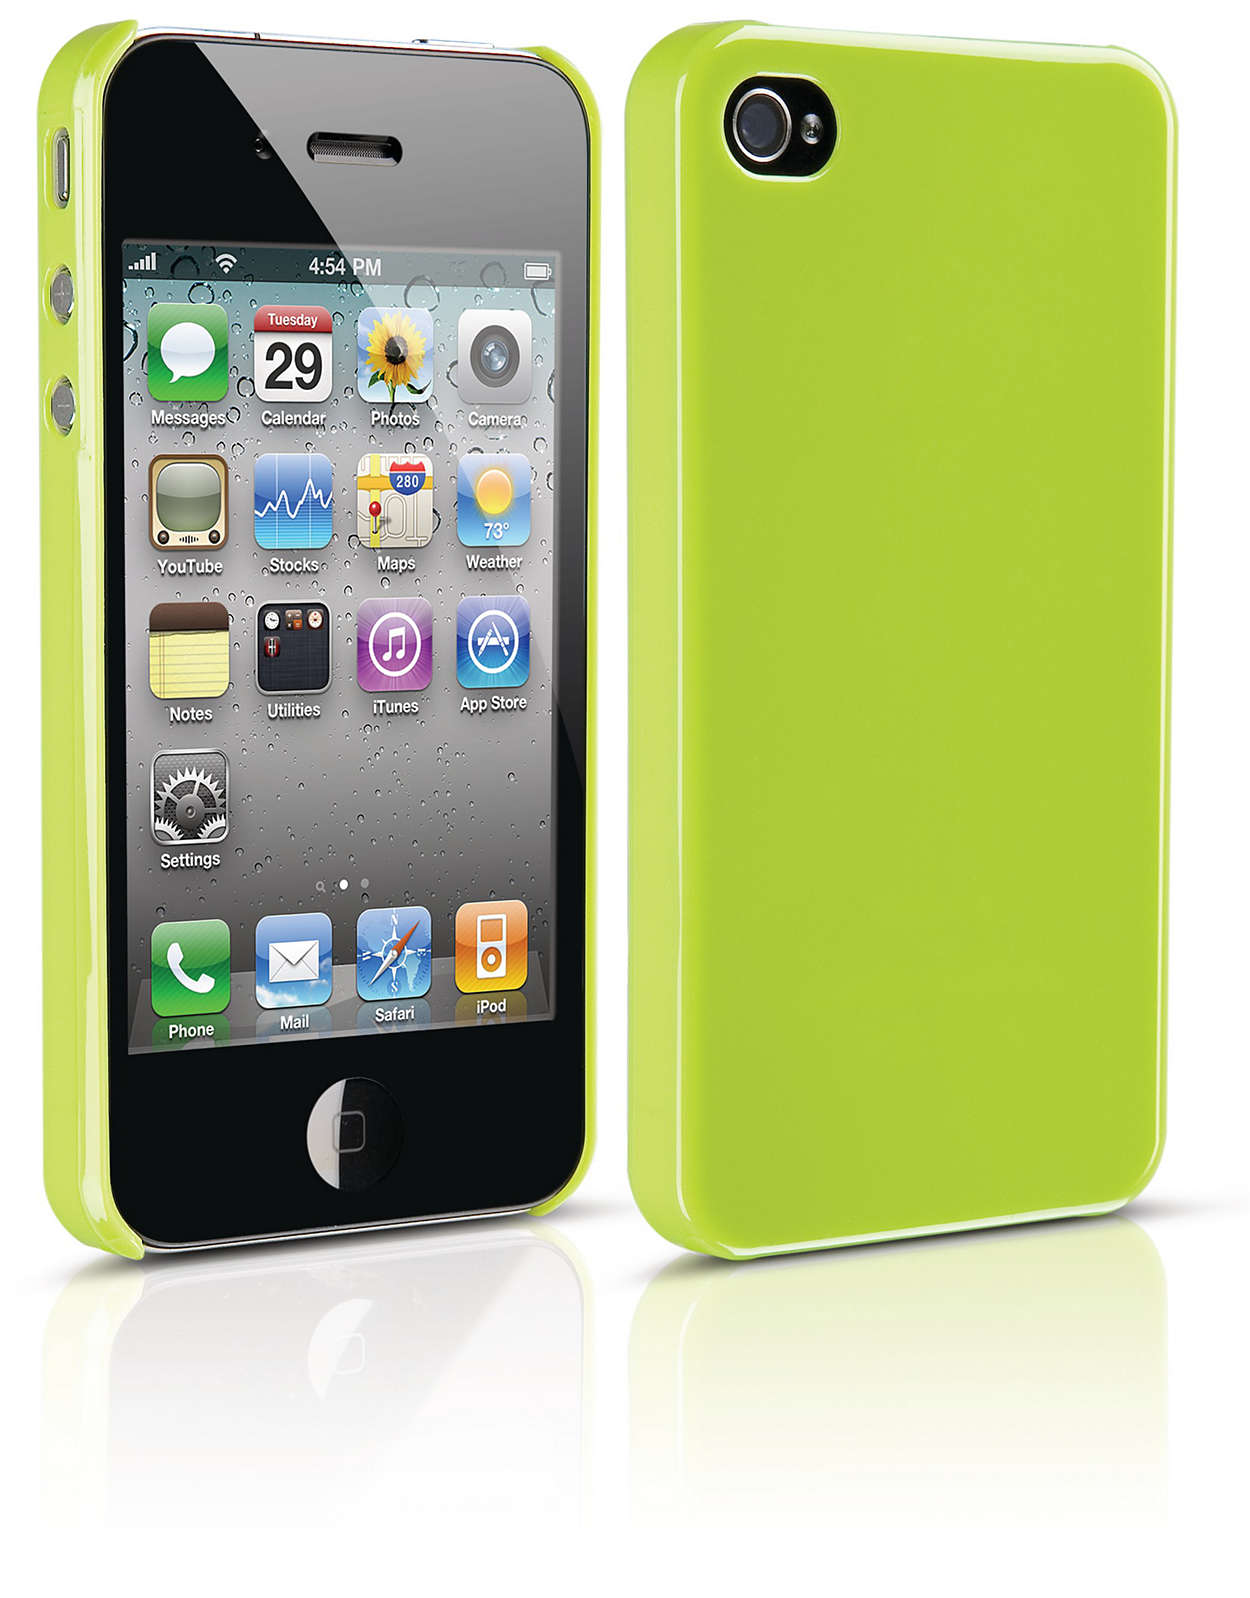 Protege tu iPhone con una funda rígida